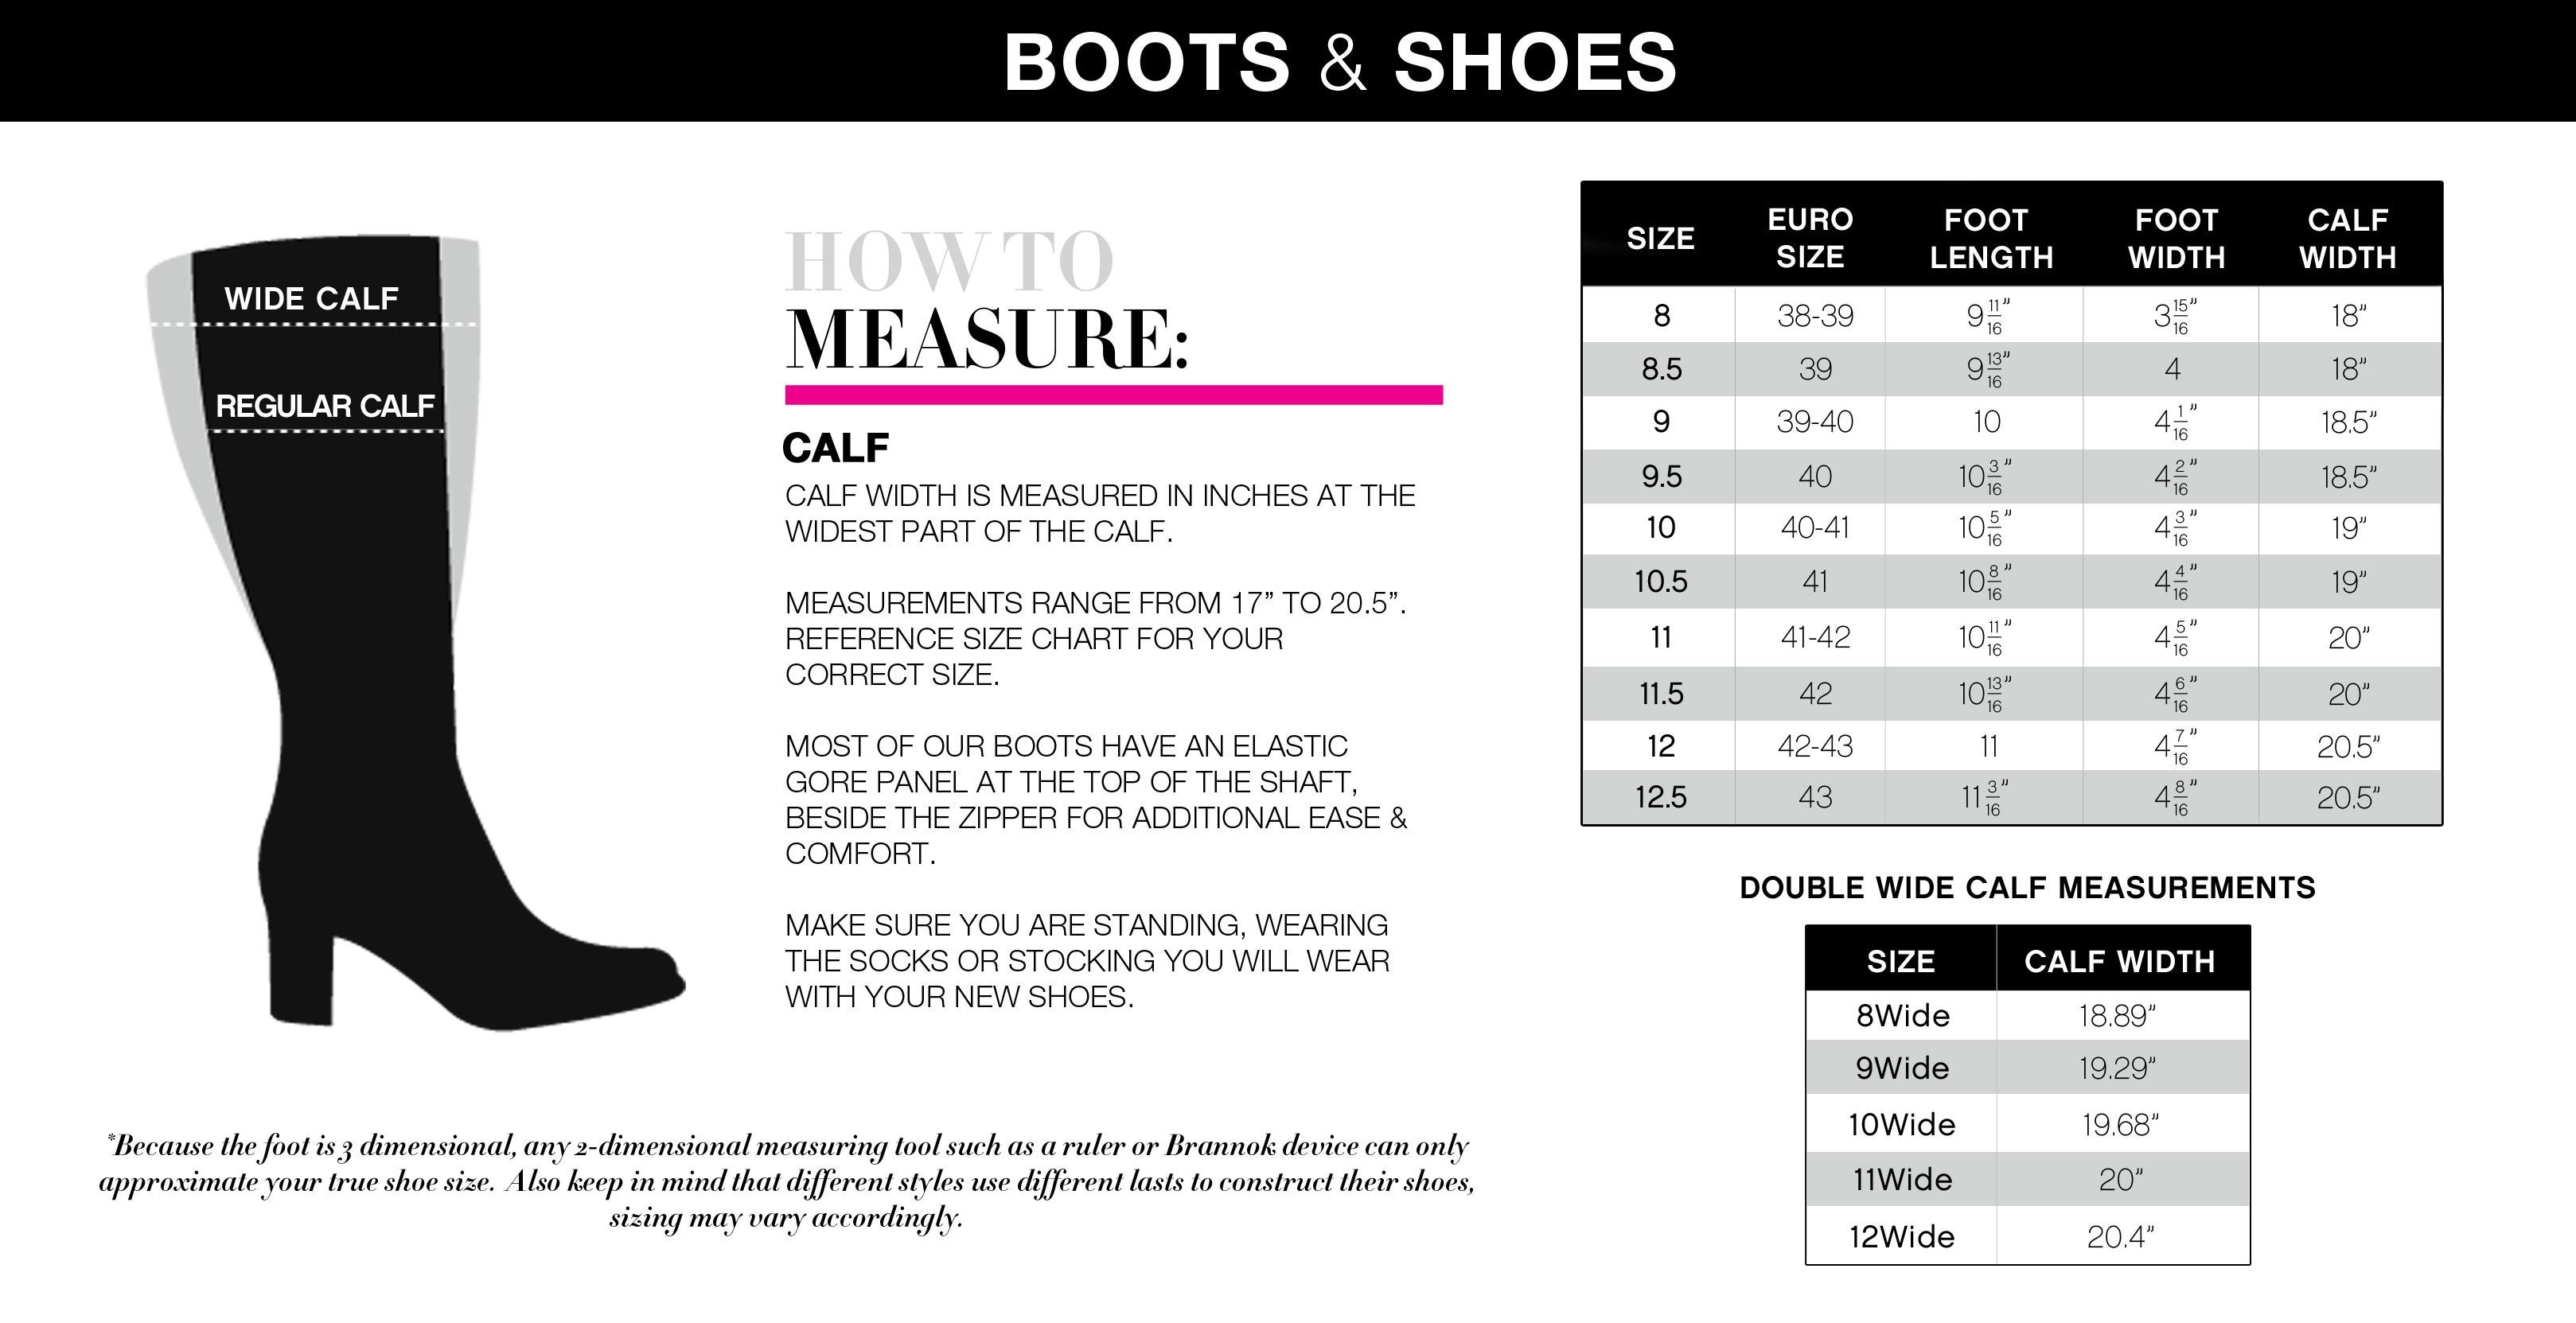 d6f42e6f6ad Plus Size Velvet Lucite Knee High Boot - Wide Calf